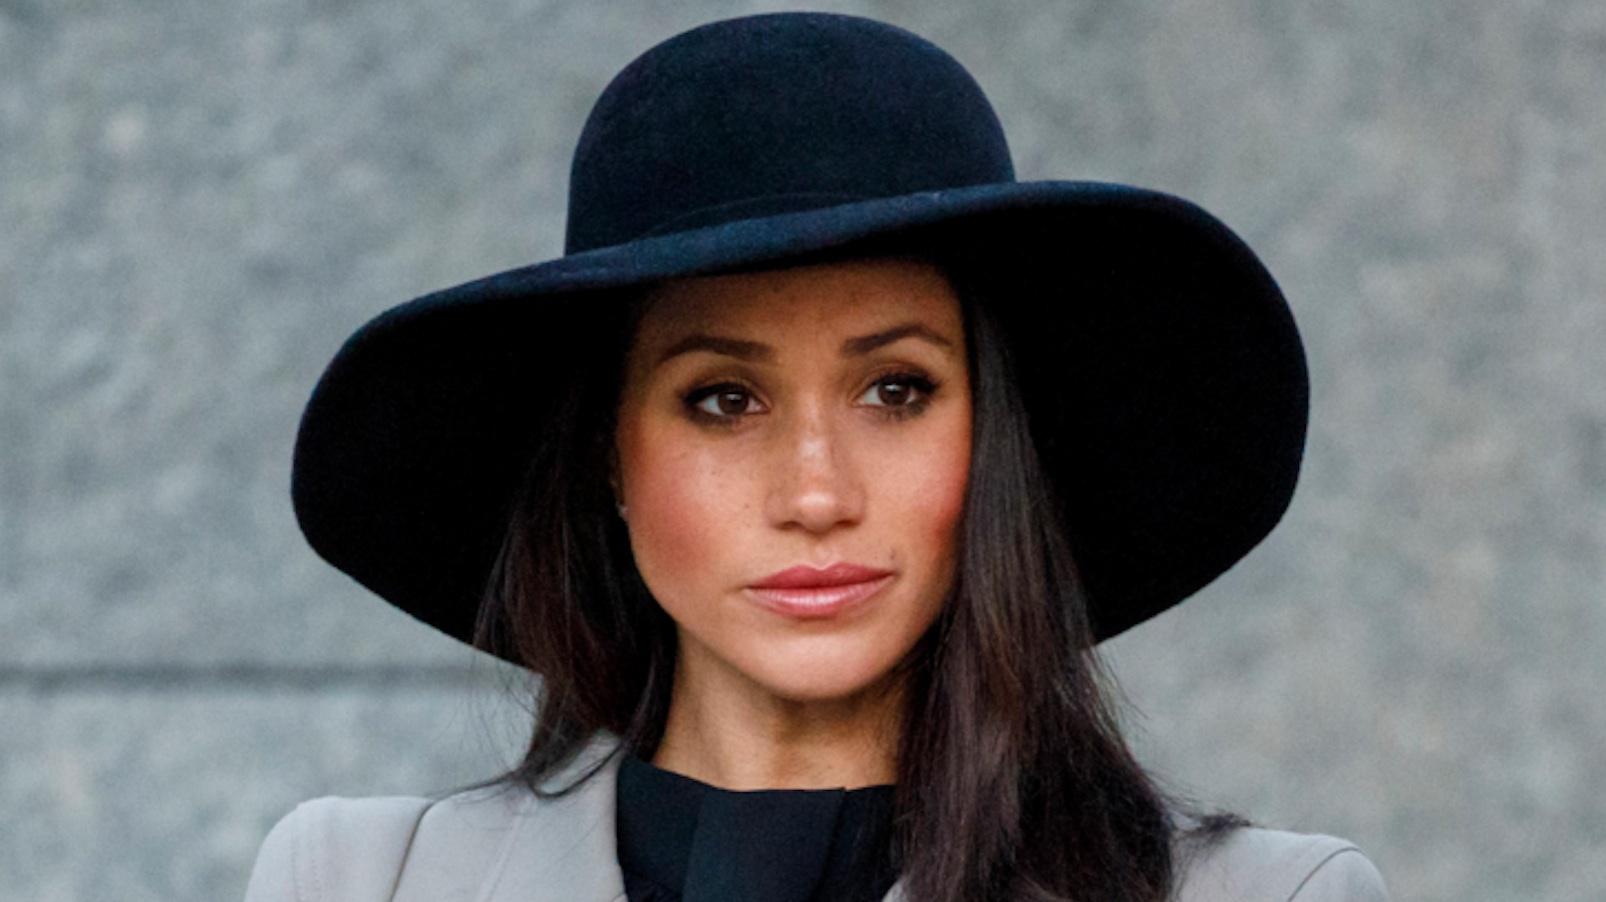 Royal Family, Harry riprende Meghan Markle in pubblico: 'Girati'